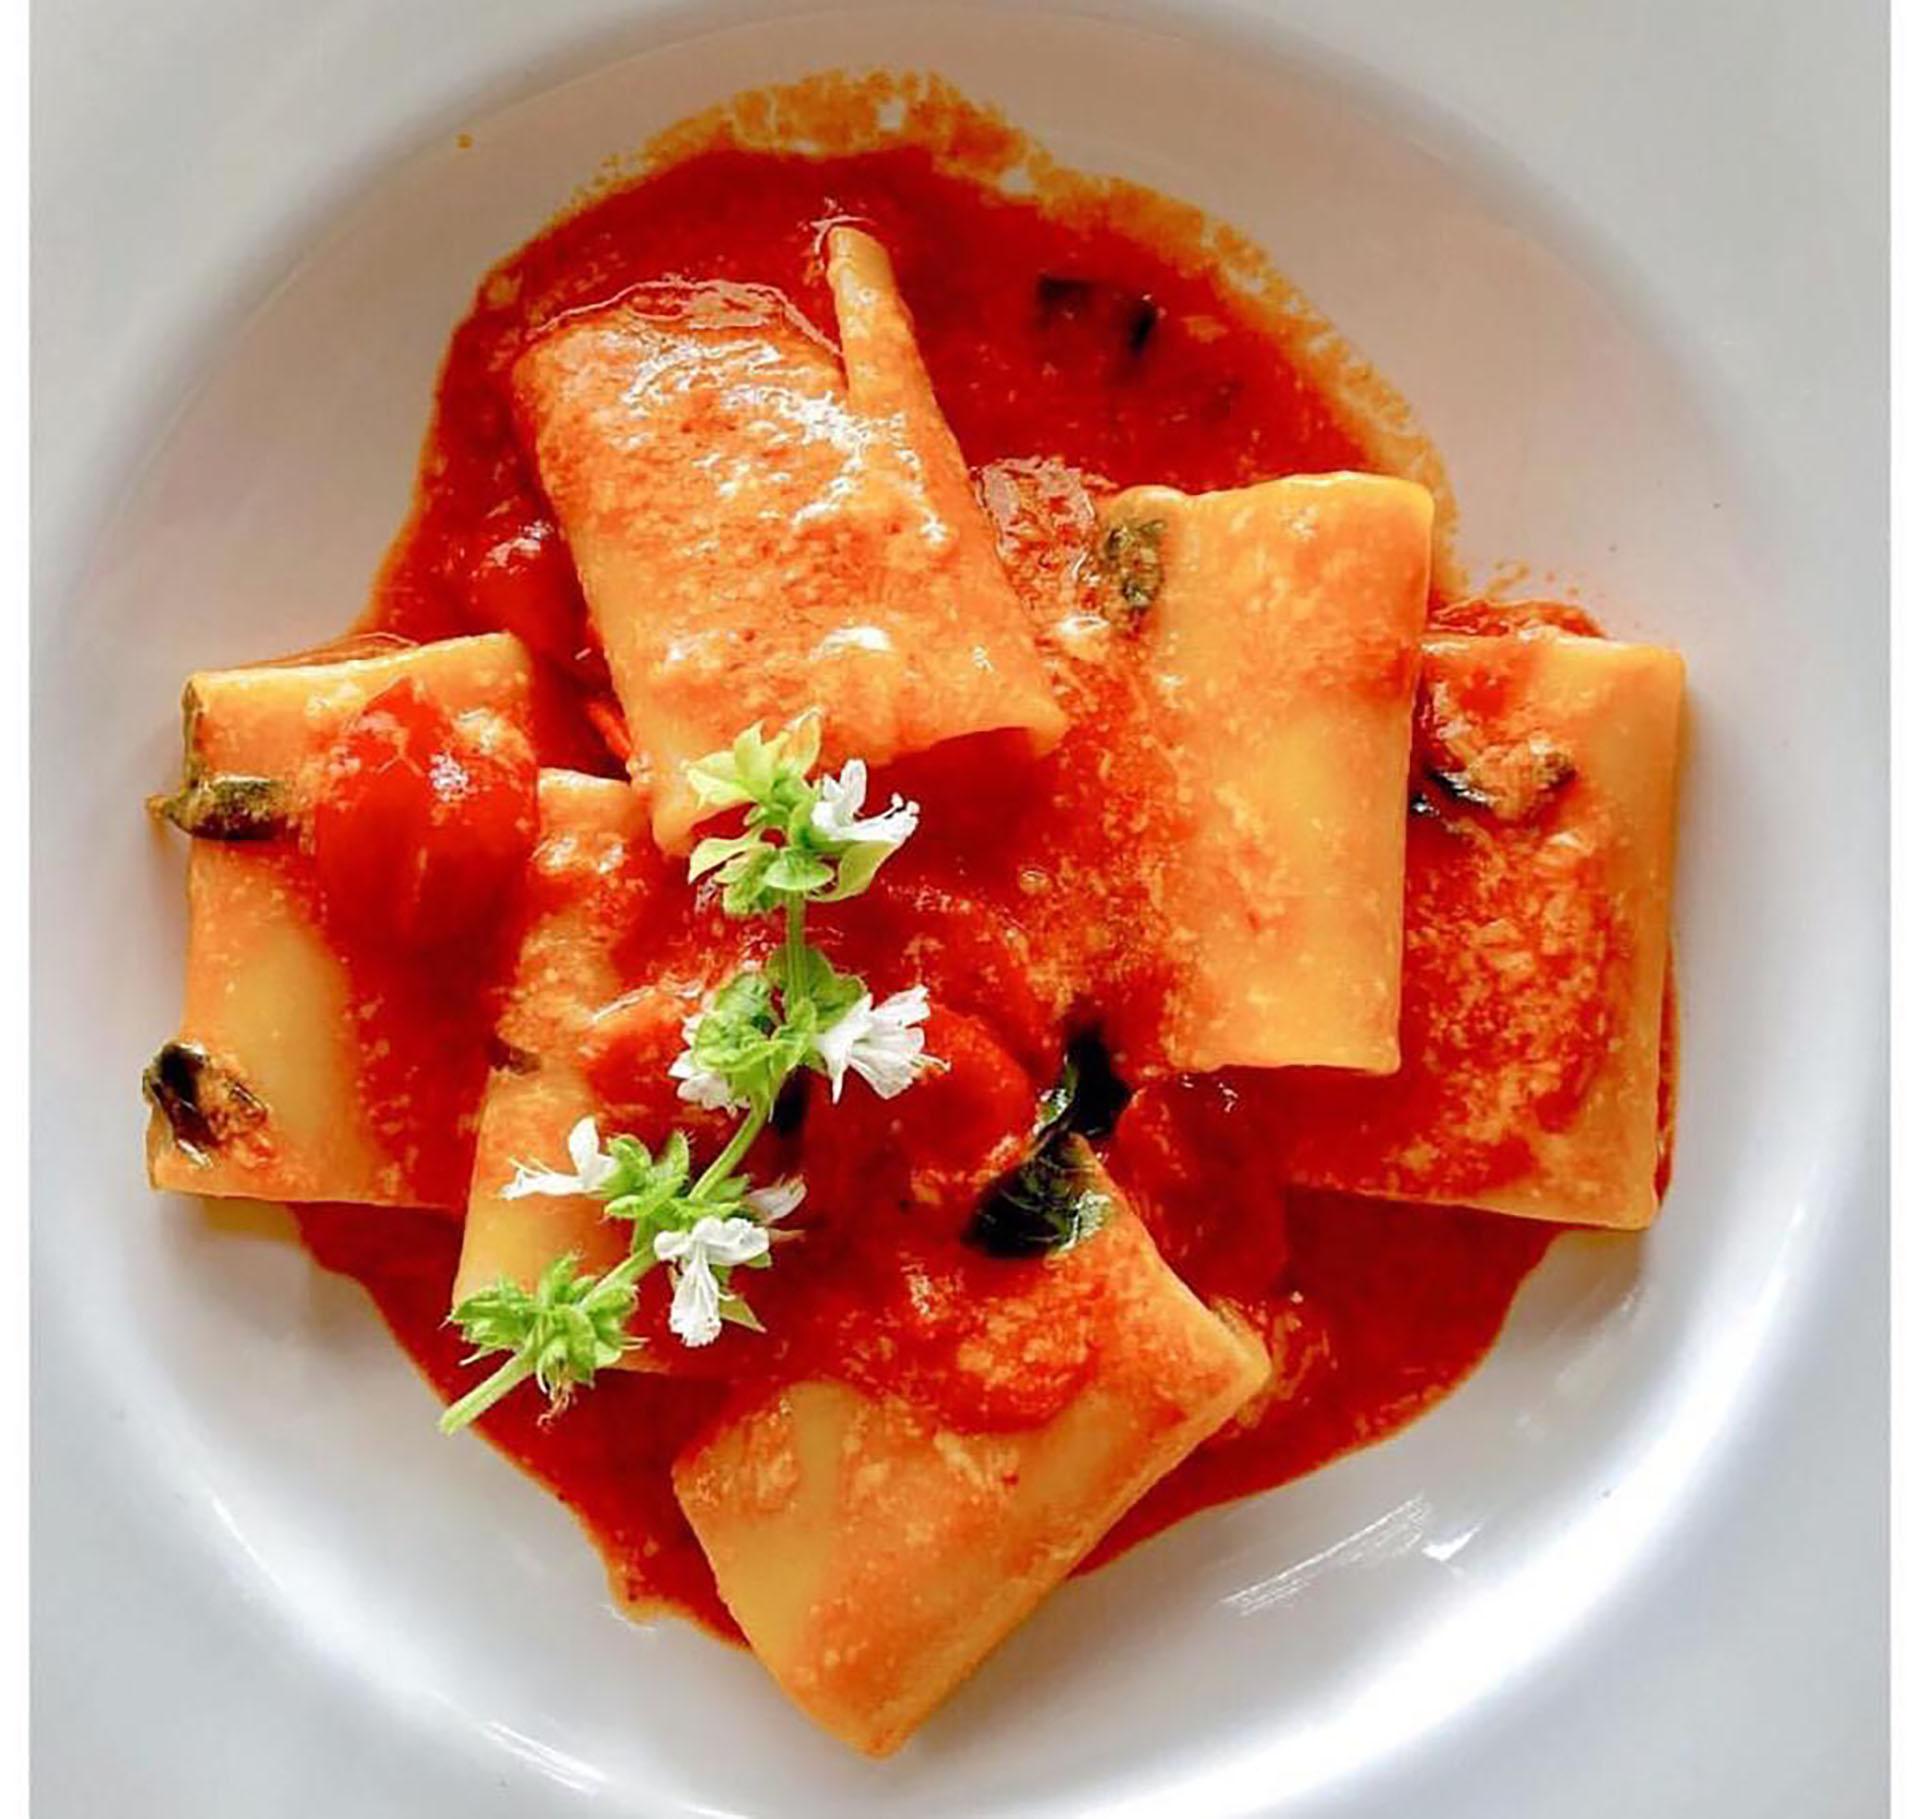 Paccheri di Nápoli, el segundo plato más pedido de la carta